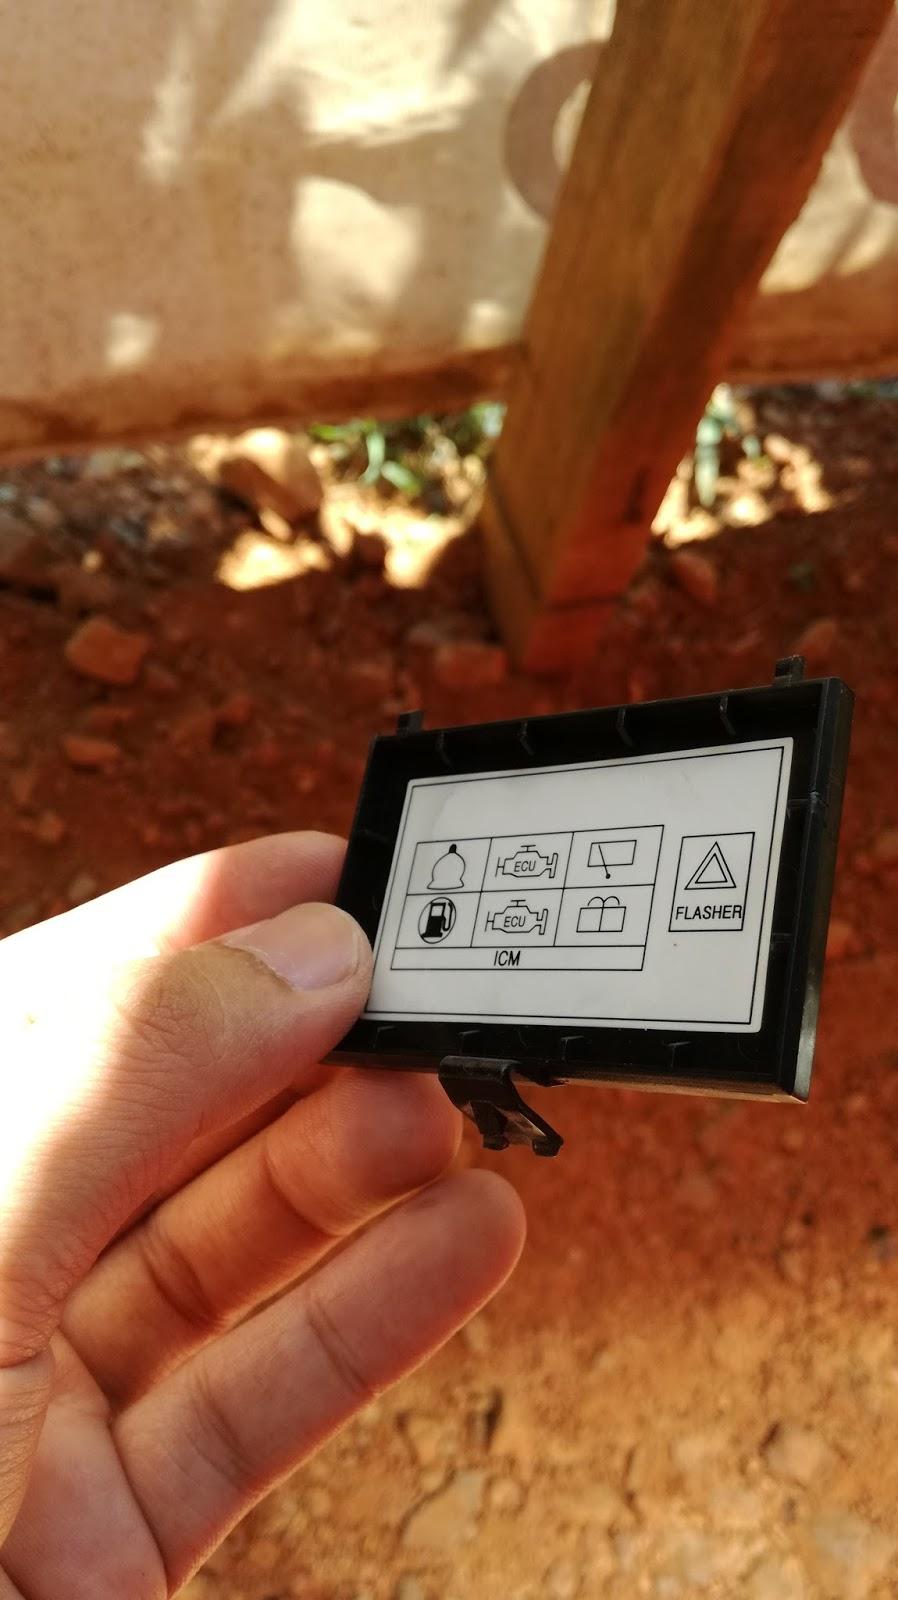 Blog Maza: Lokasi ICM Relay / Fuel Pump Relay Proton Gen2